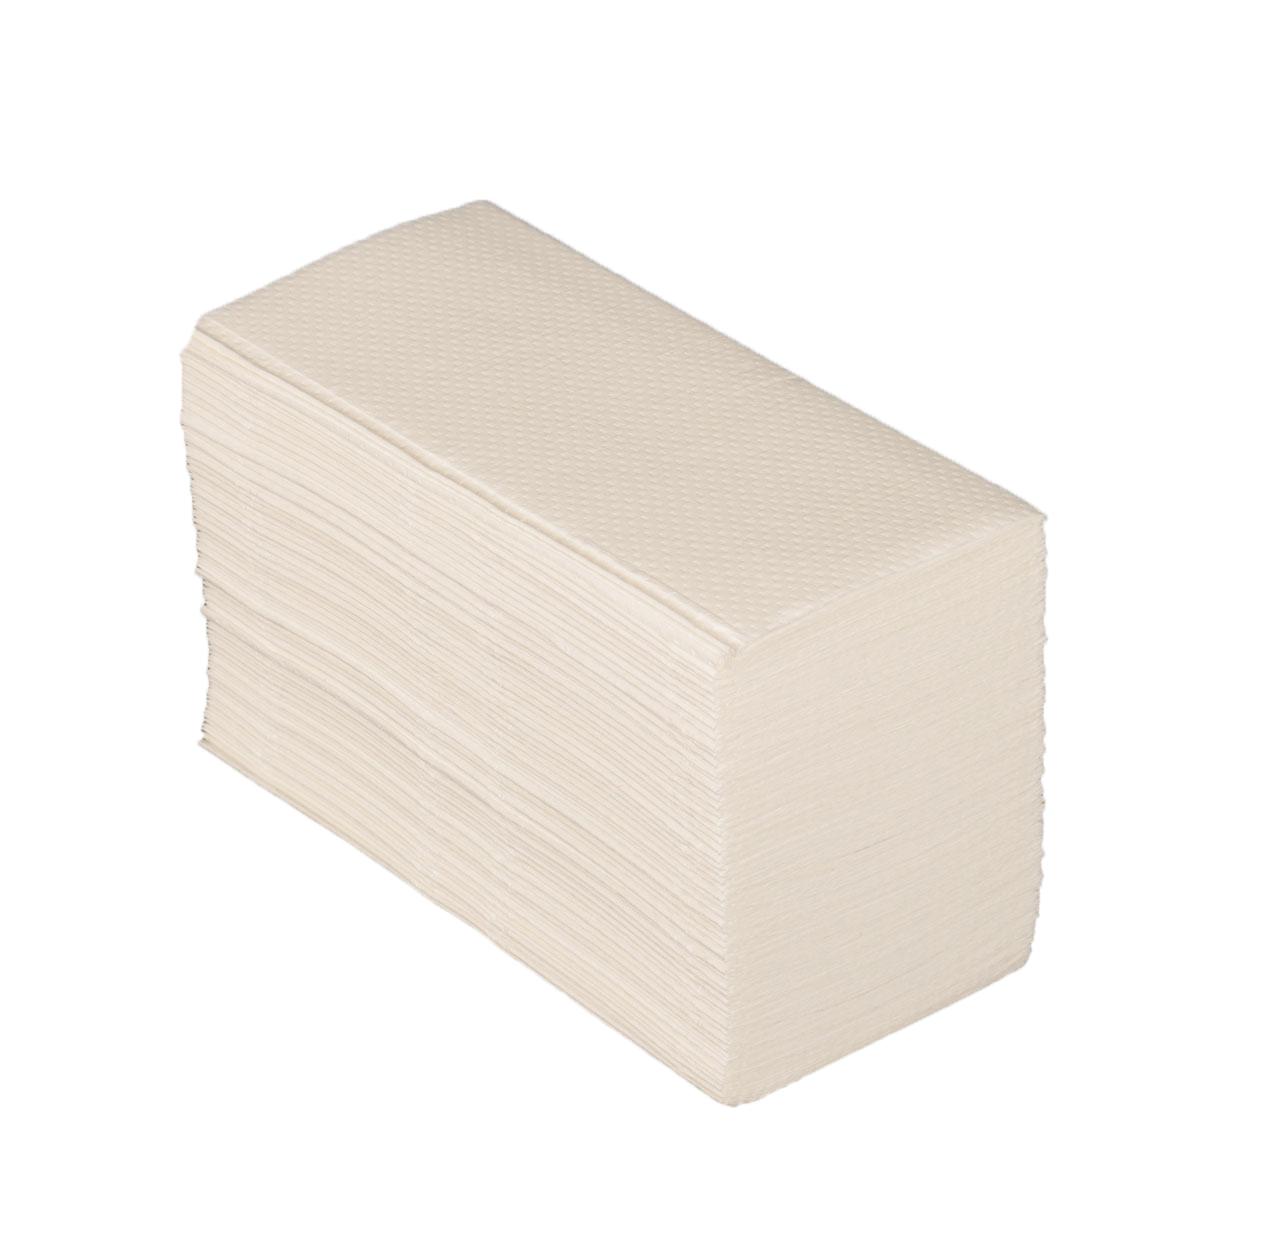 HANDTOWEL - White Nfold 32x22cm (cel.3p)